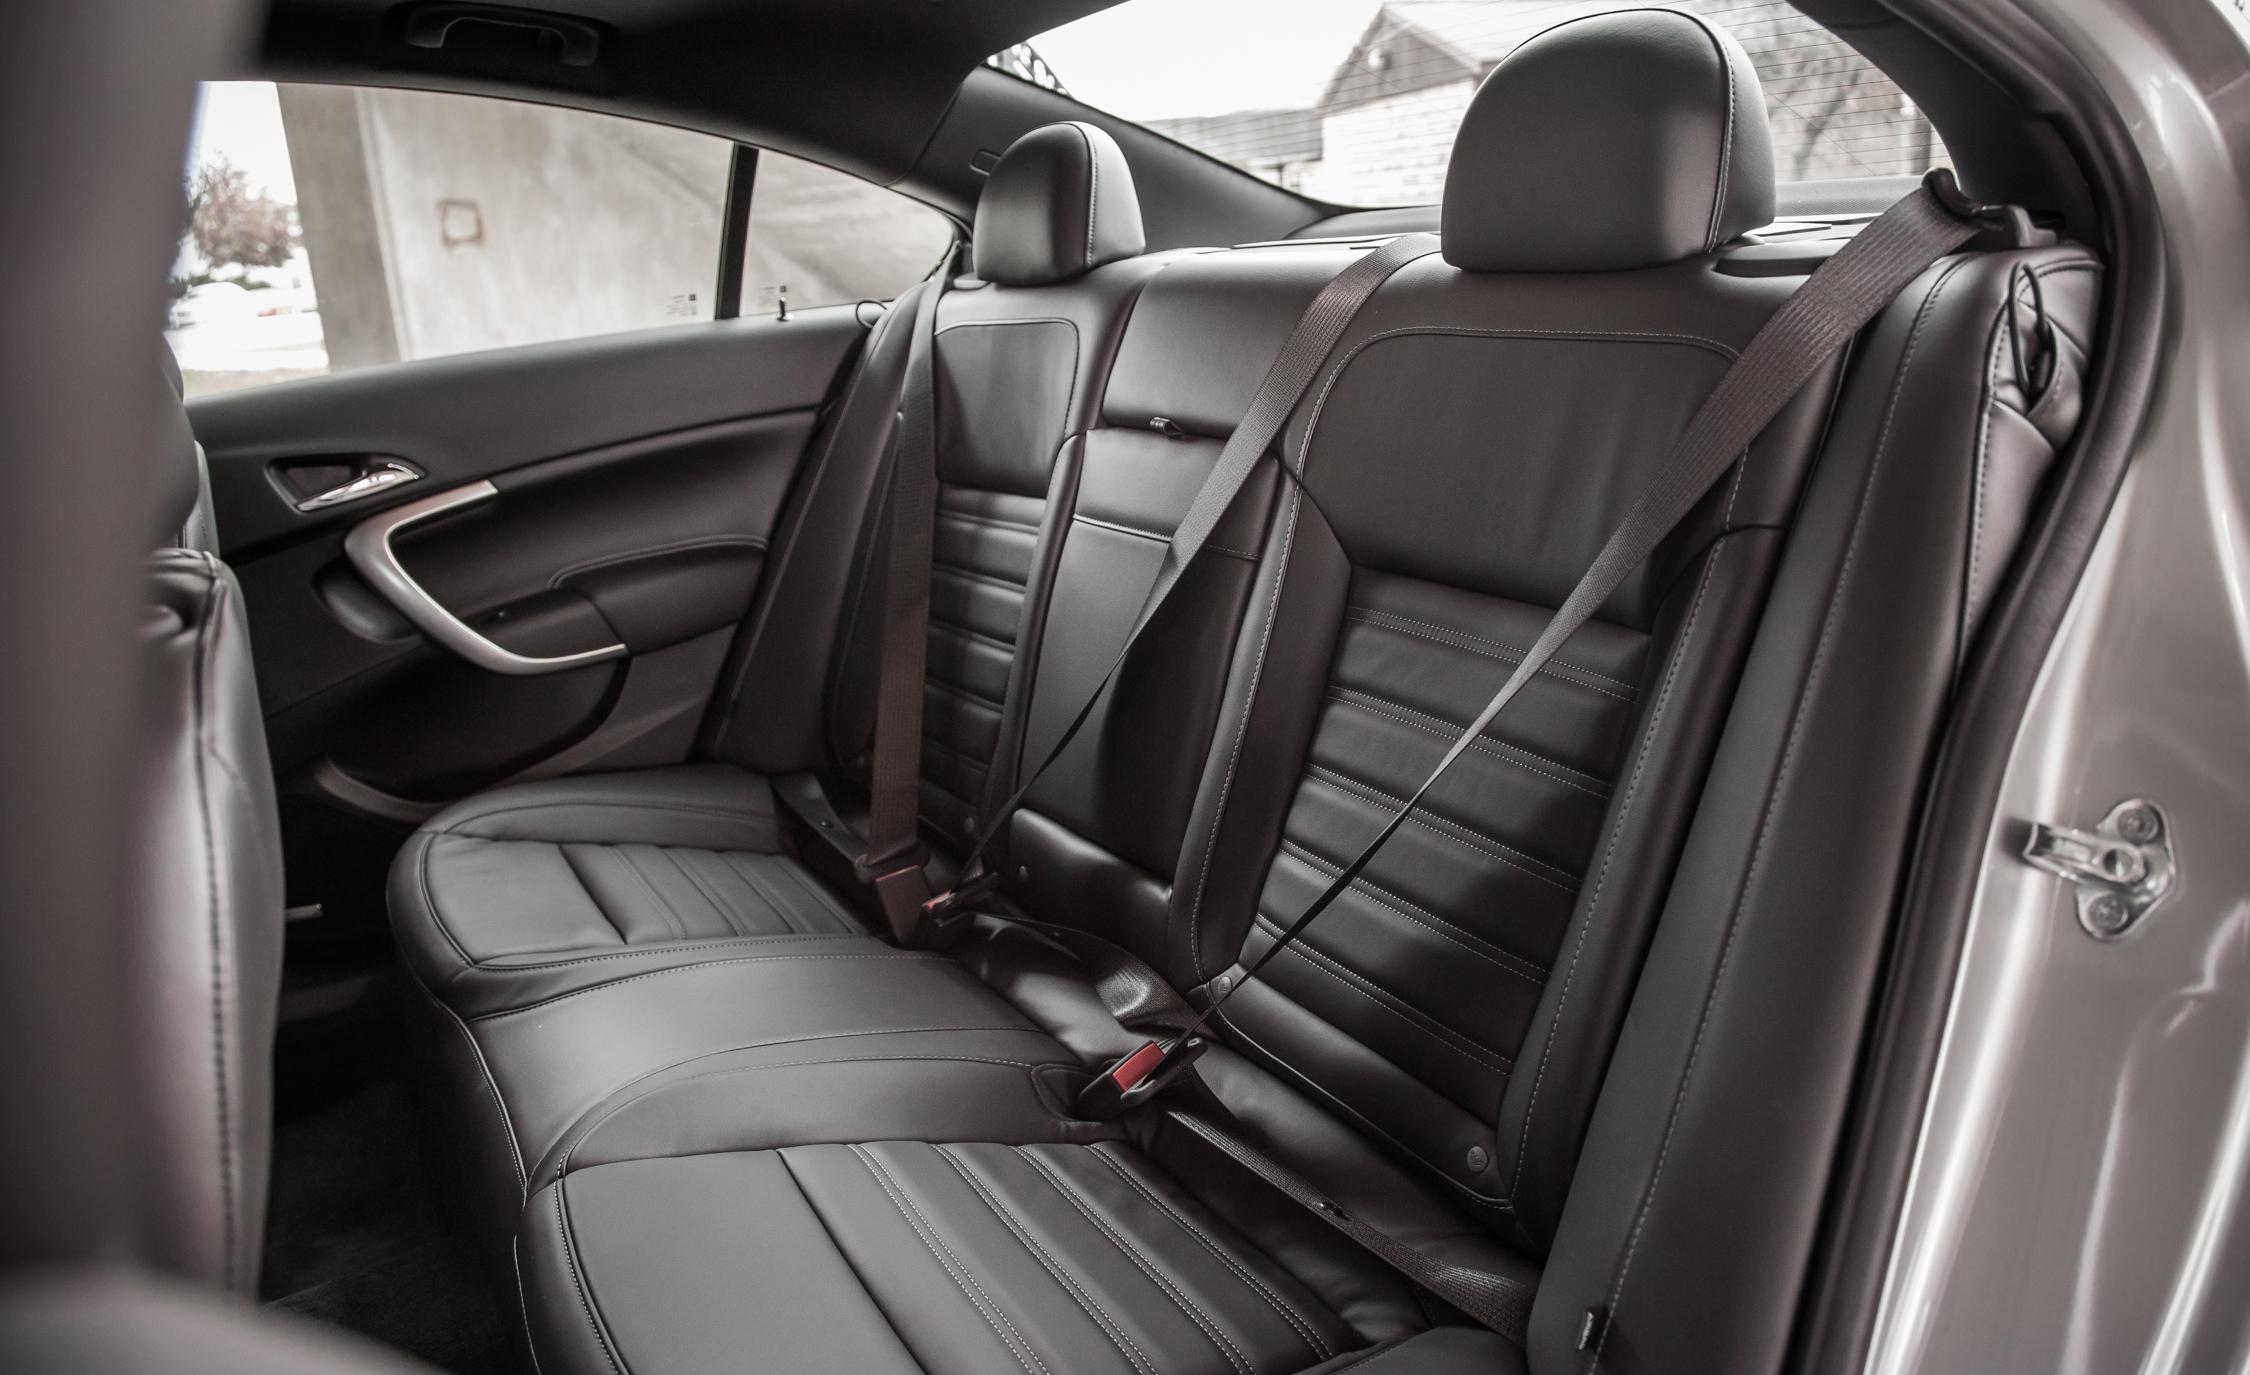 2014 Buick Regal GS Interior (Photo 10 of 30)